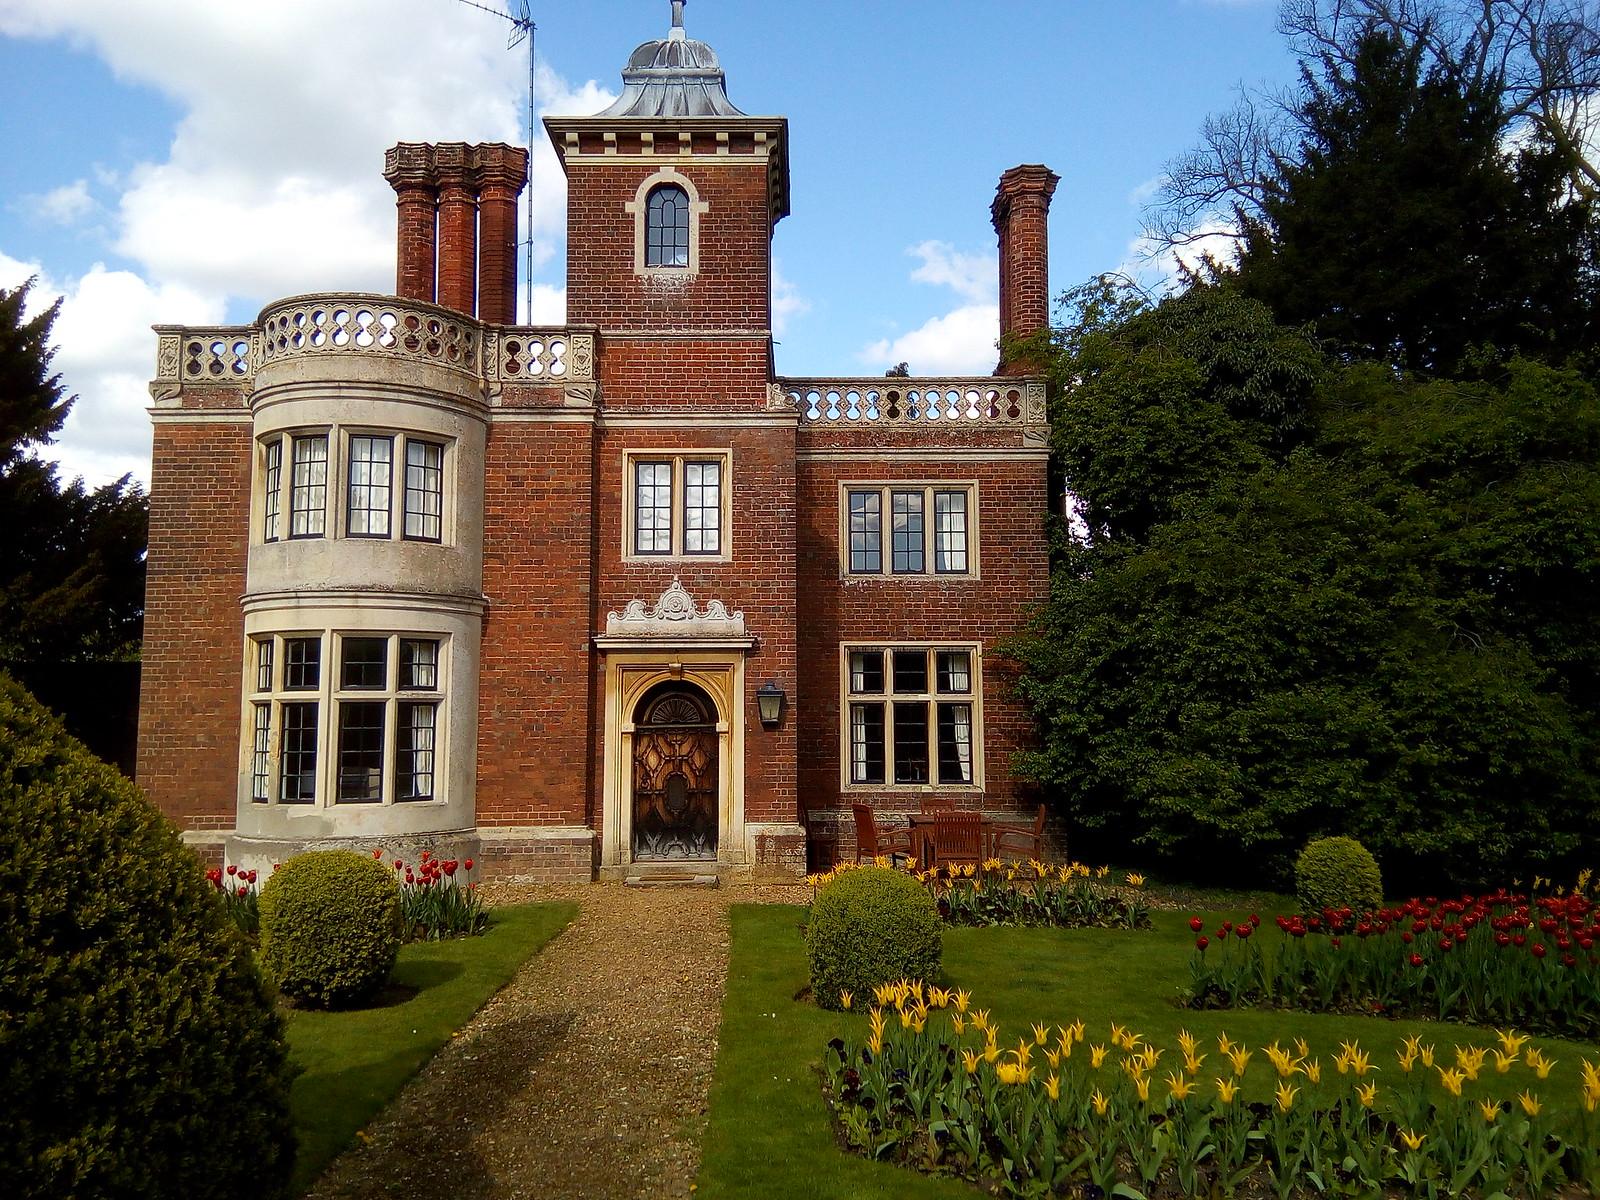 Audley End Gatehouse